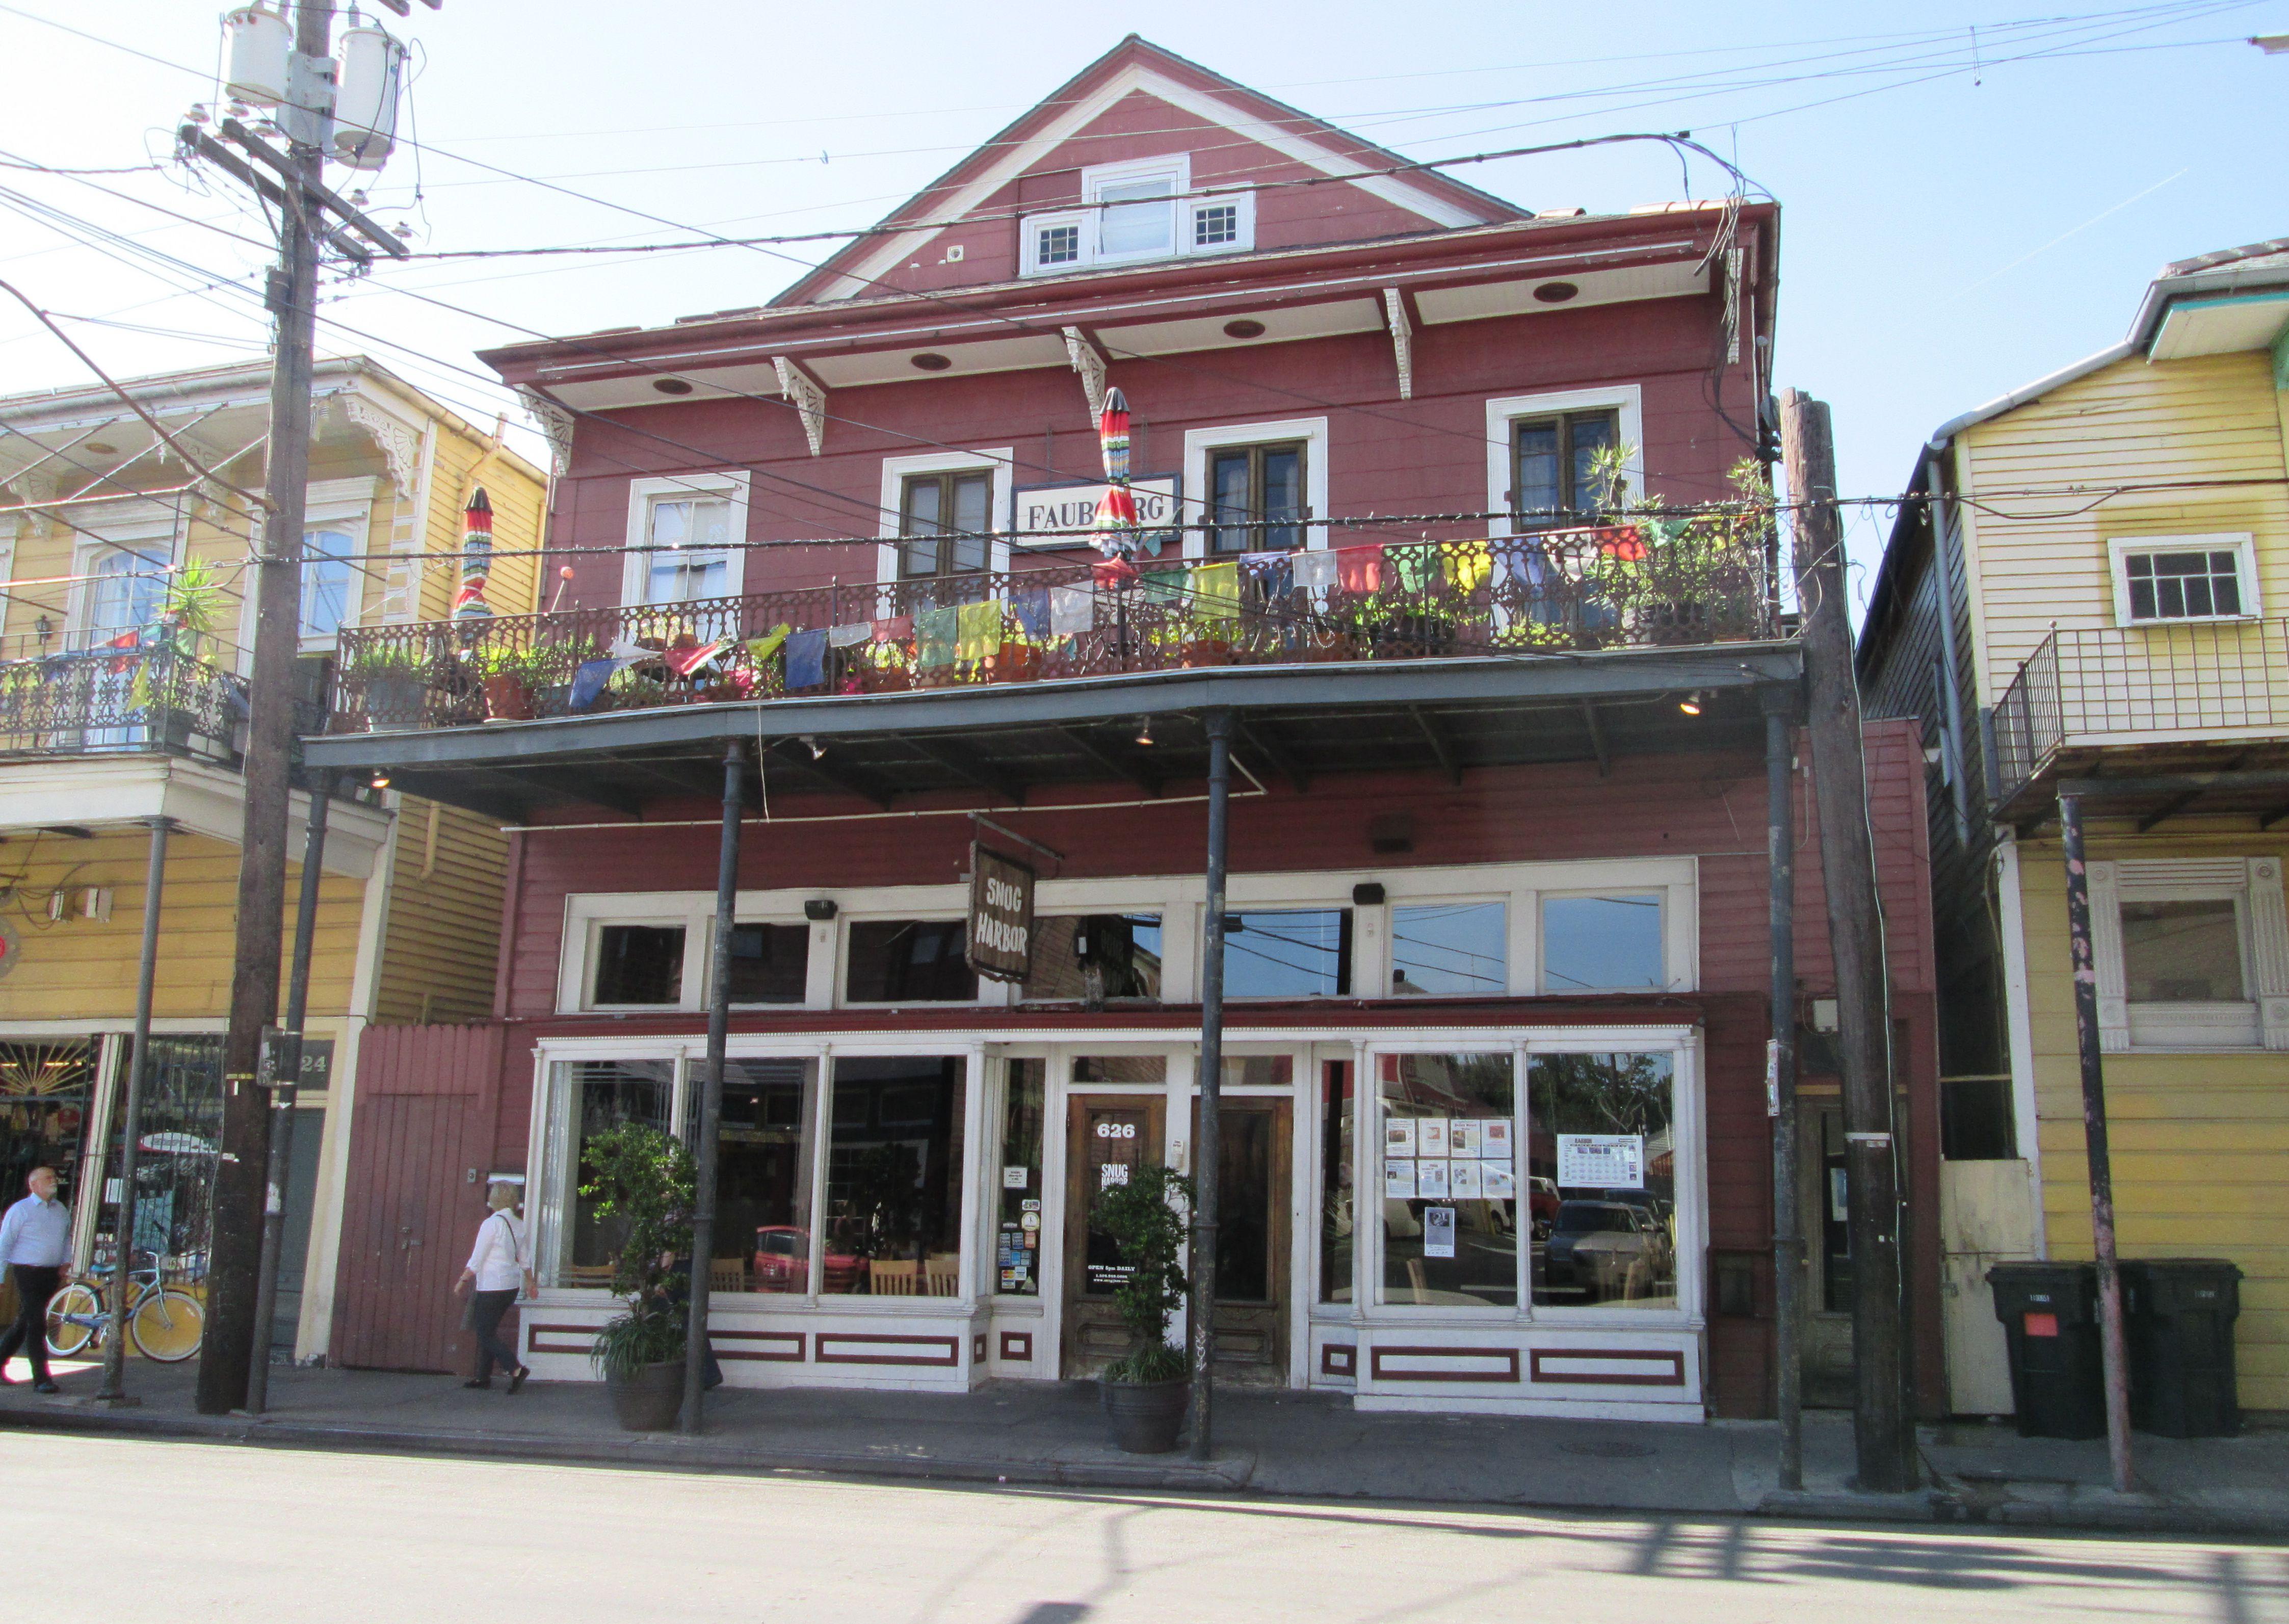 Snug Harbour se encuentra en la famosa franja musical de Frenchmen Street